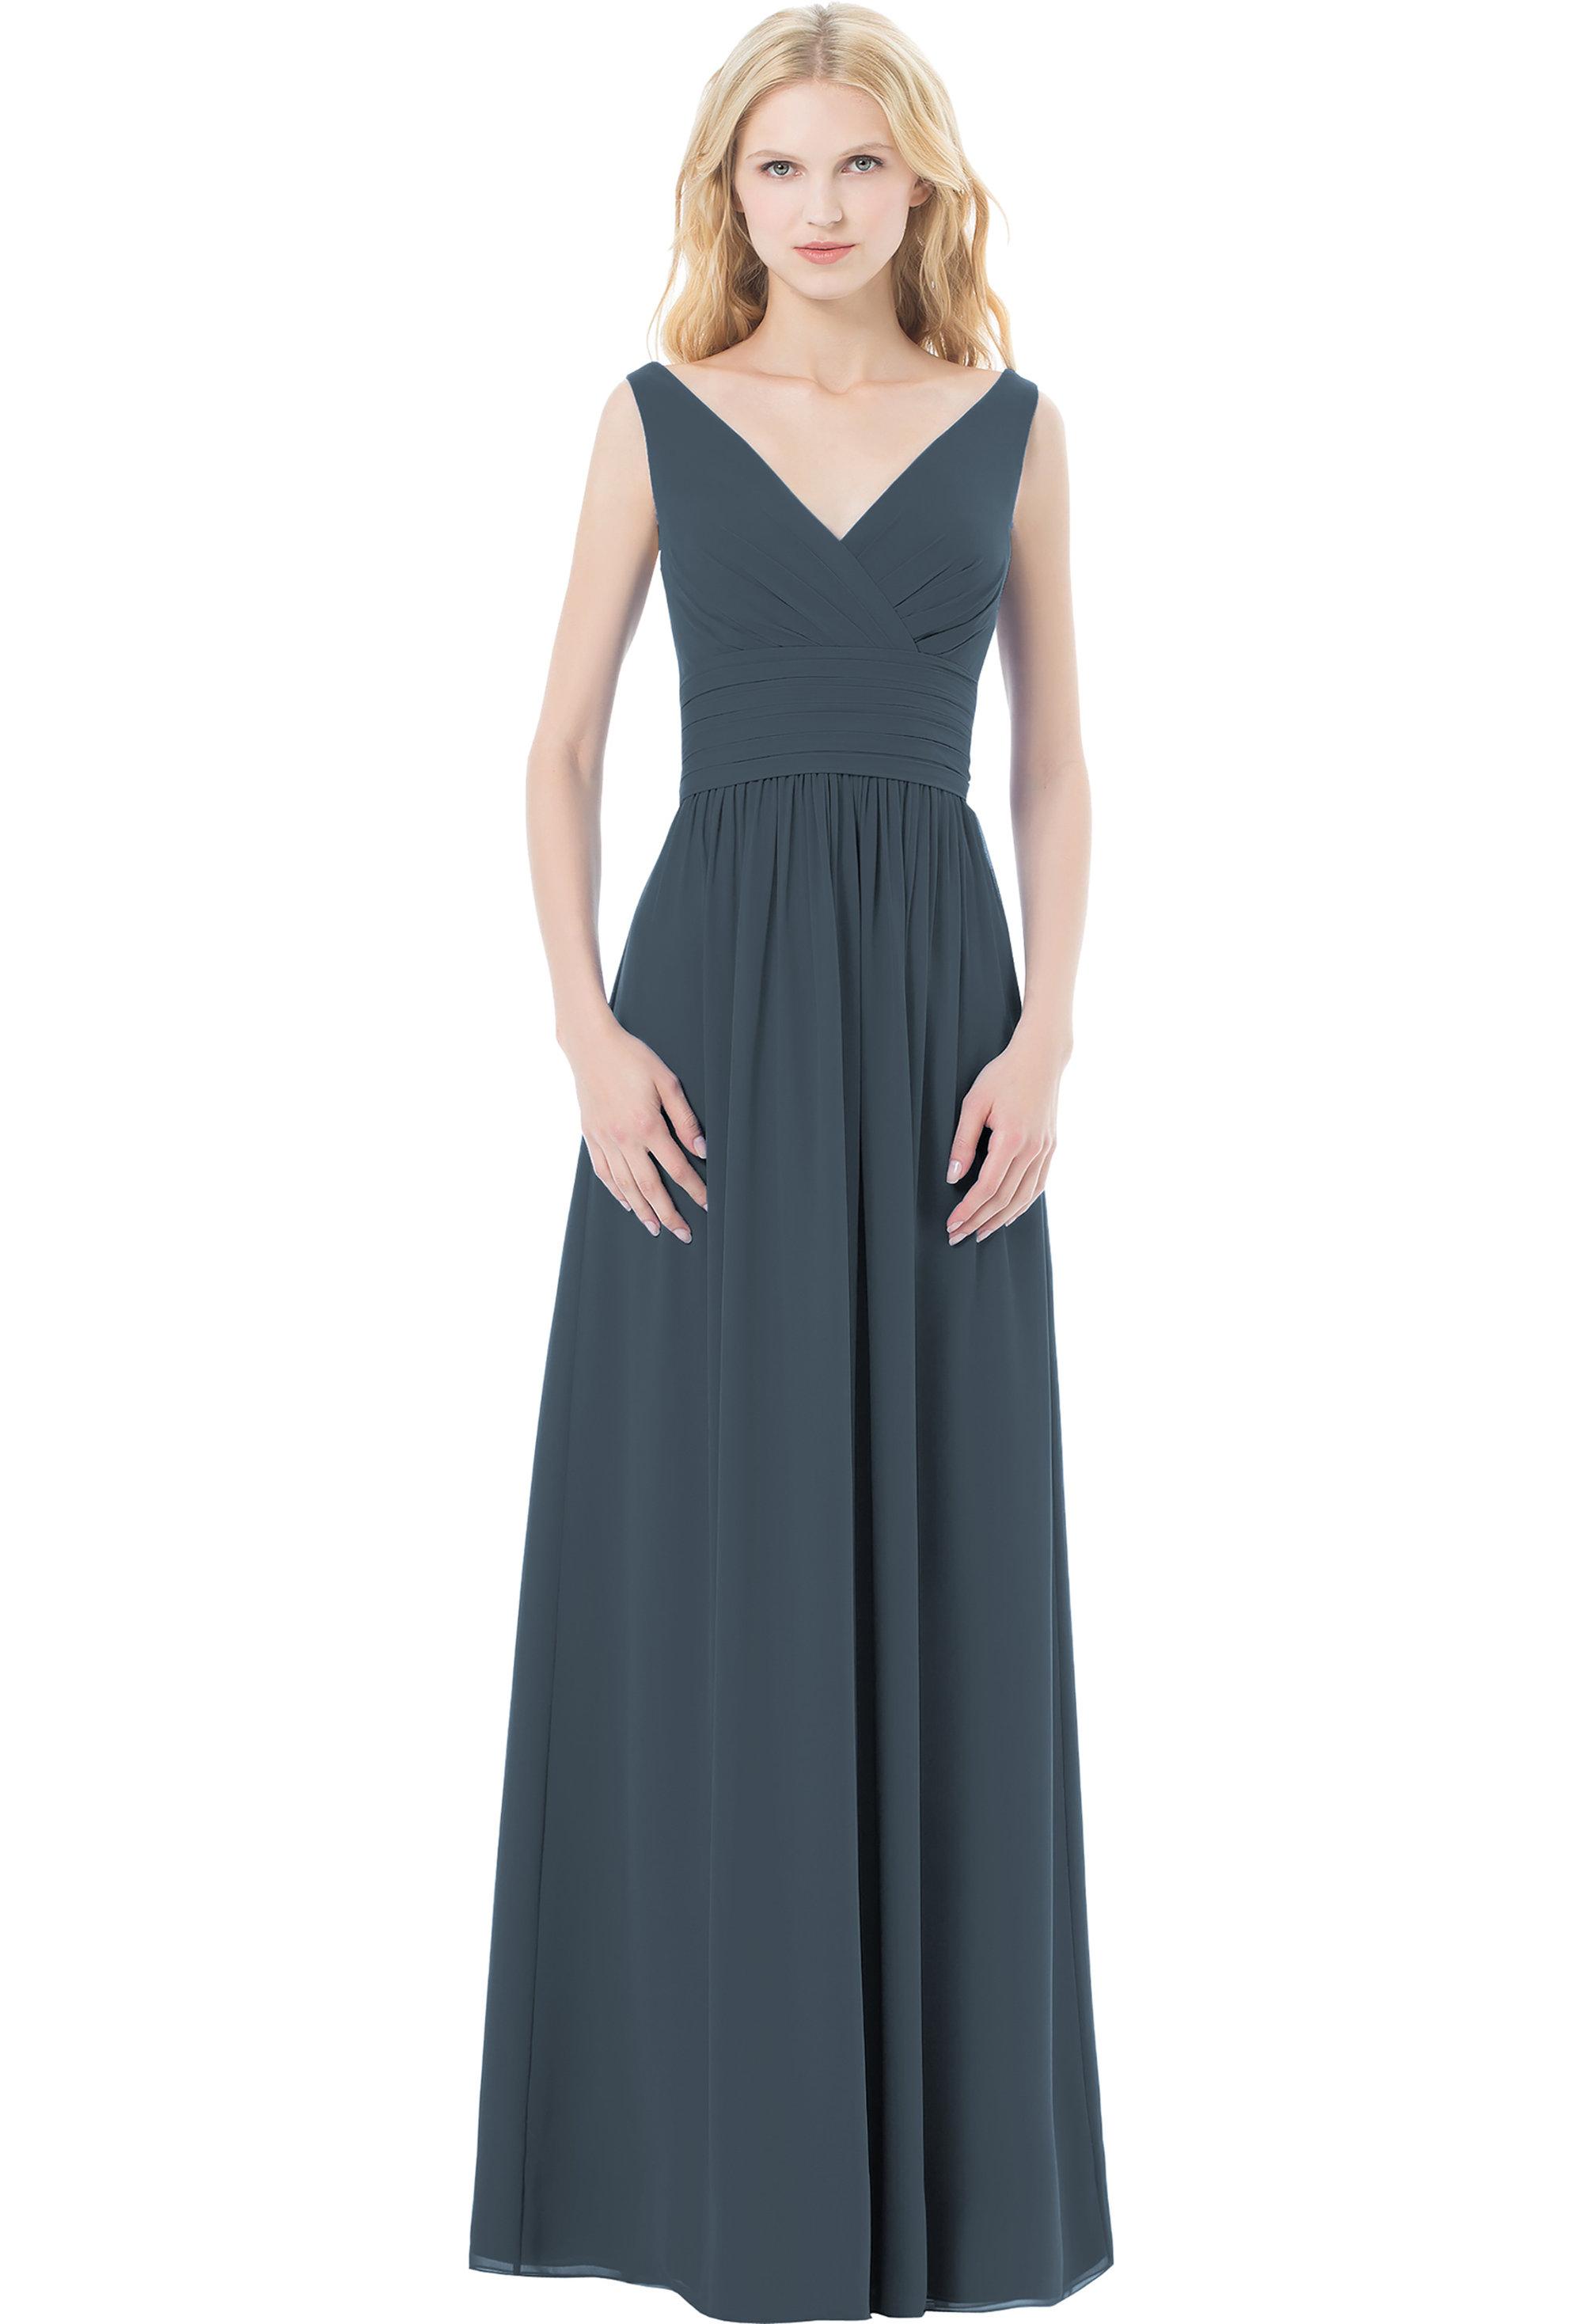 Bill Levkoff SLATE Chiffon Sleeveless A-line gown, $220.00 Front